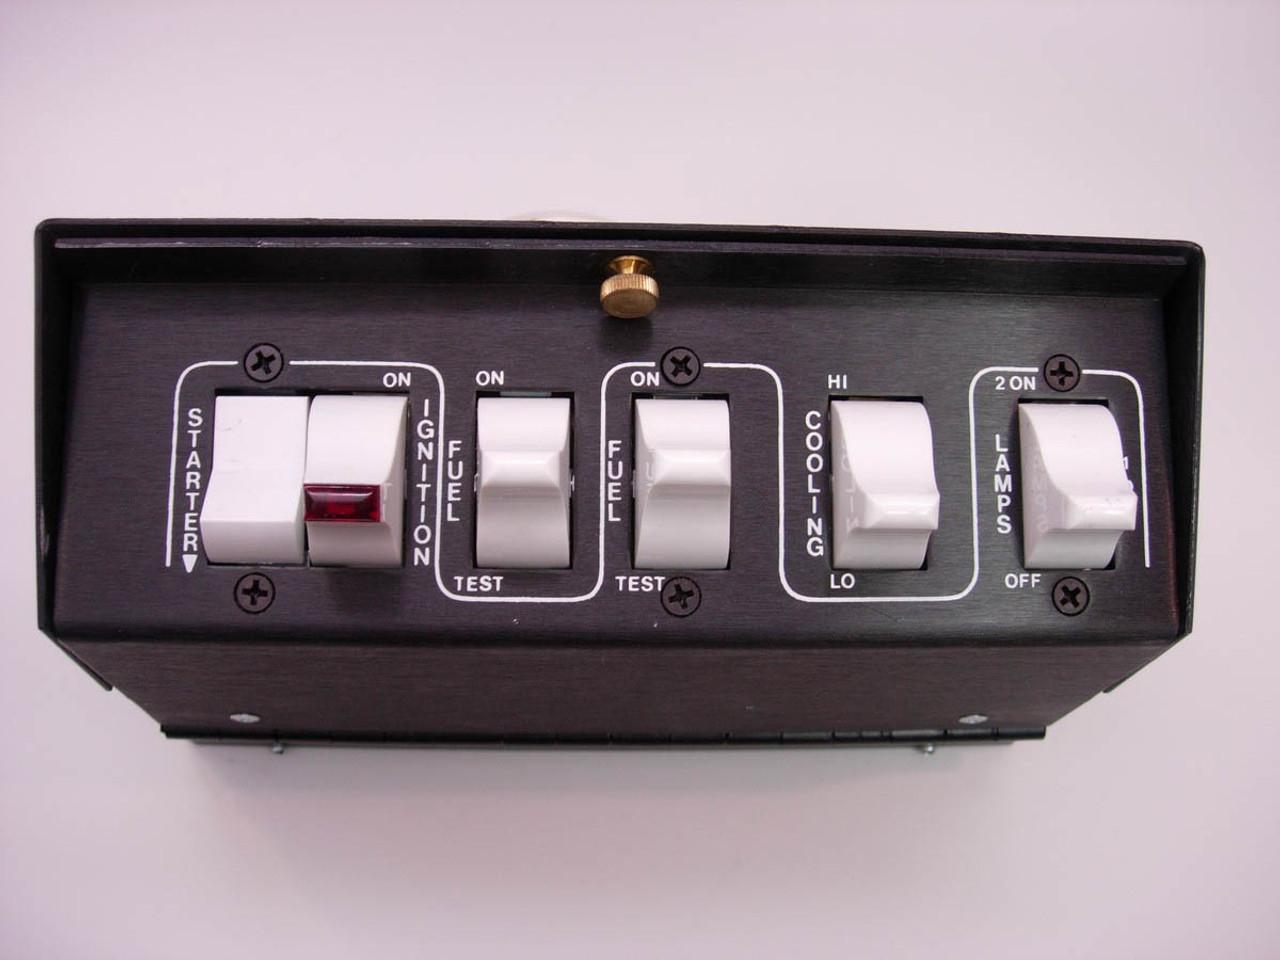 ARC3700, Switch Panel, Pro Street, Bar Mount, 8 x 2-3/8 x 2 in, 7 Rocker Switches, Fused, Aluminum, Black, Kit